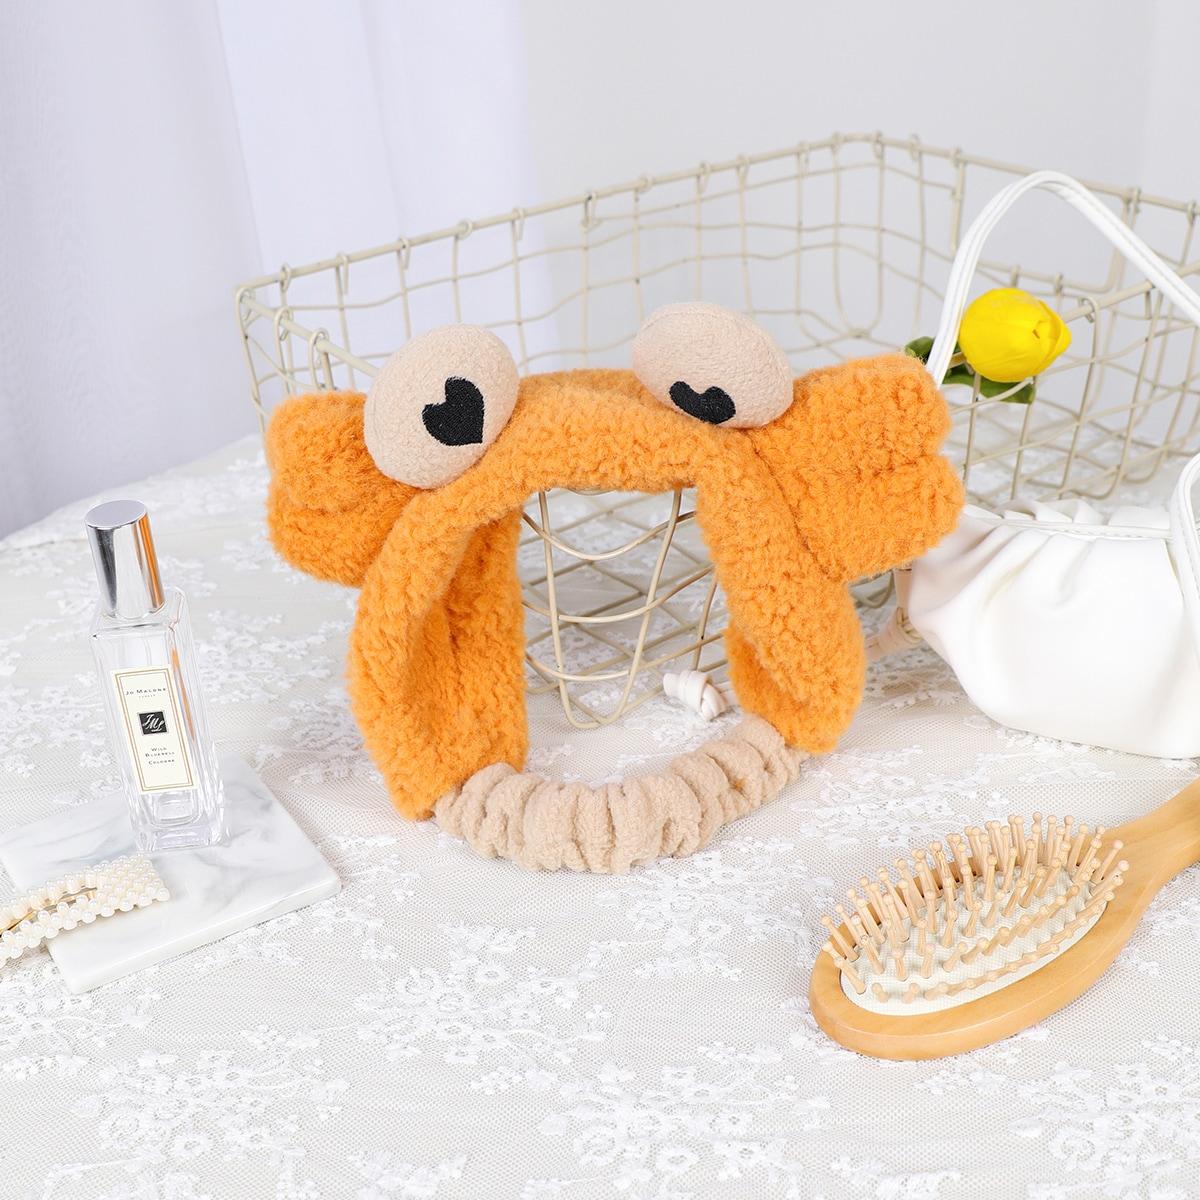 1шт Повязка на голову для ванны в форме краба